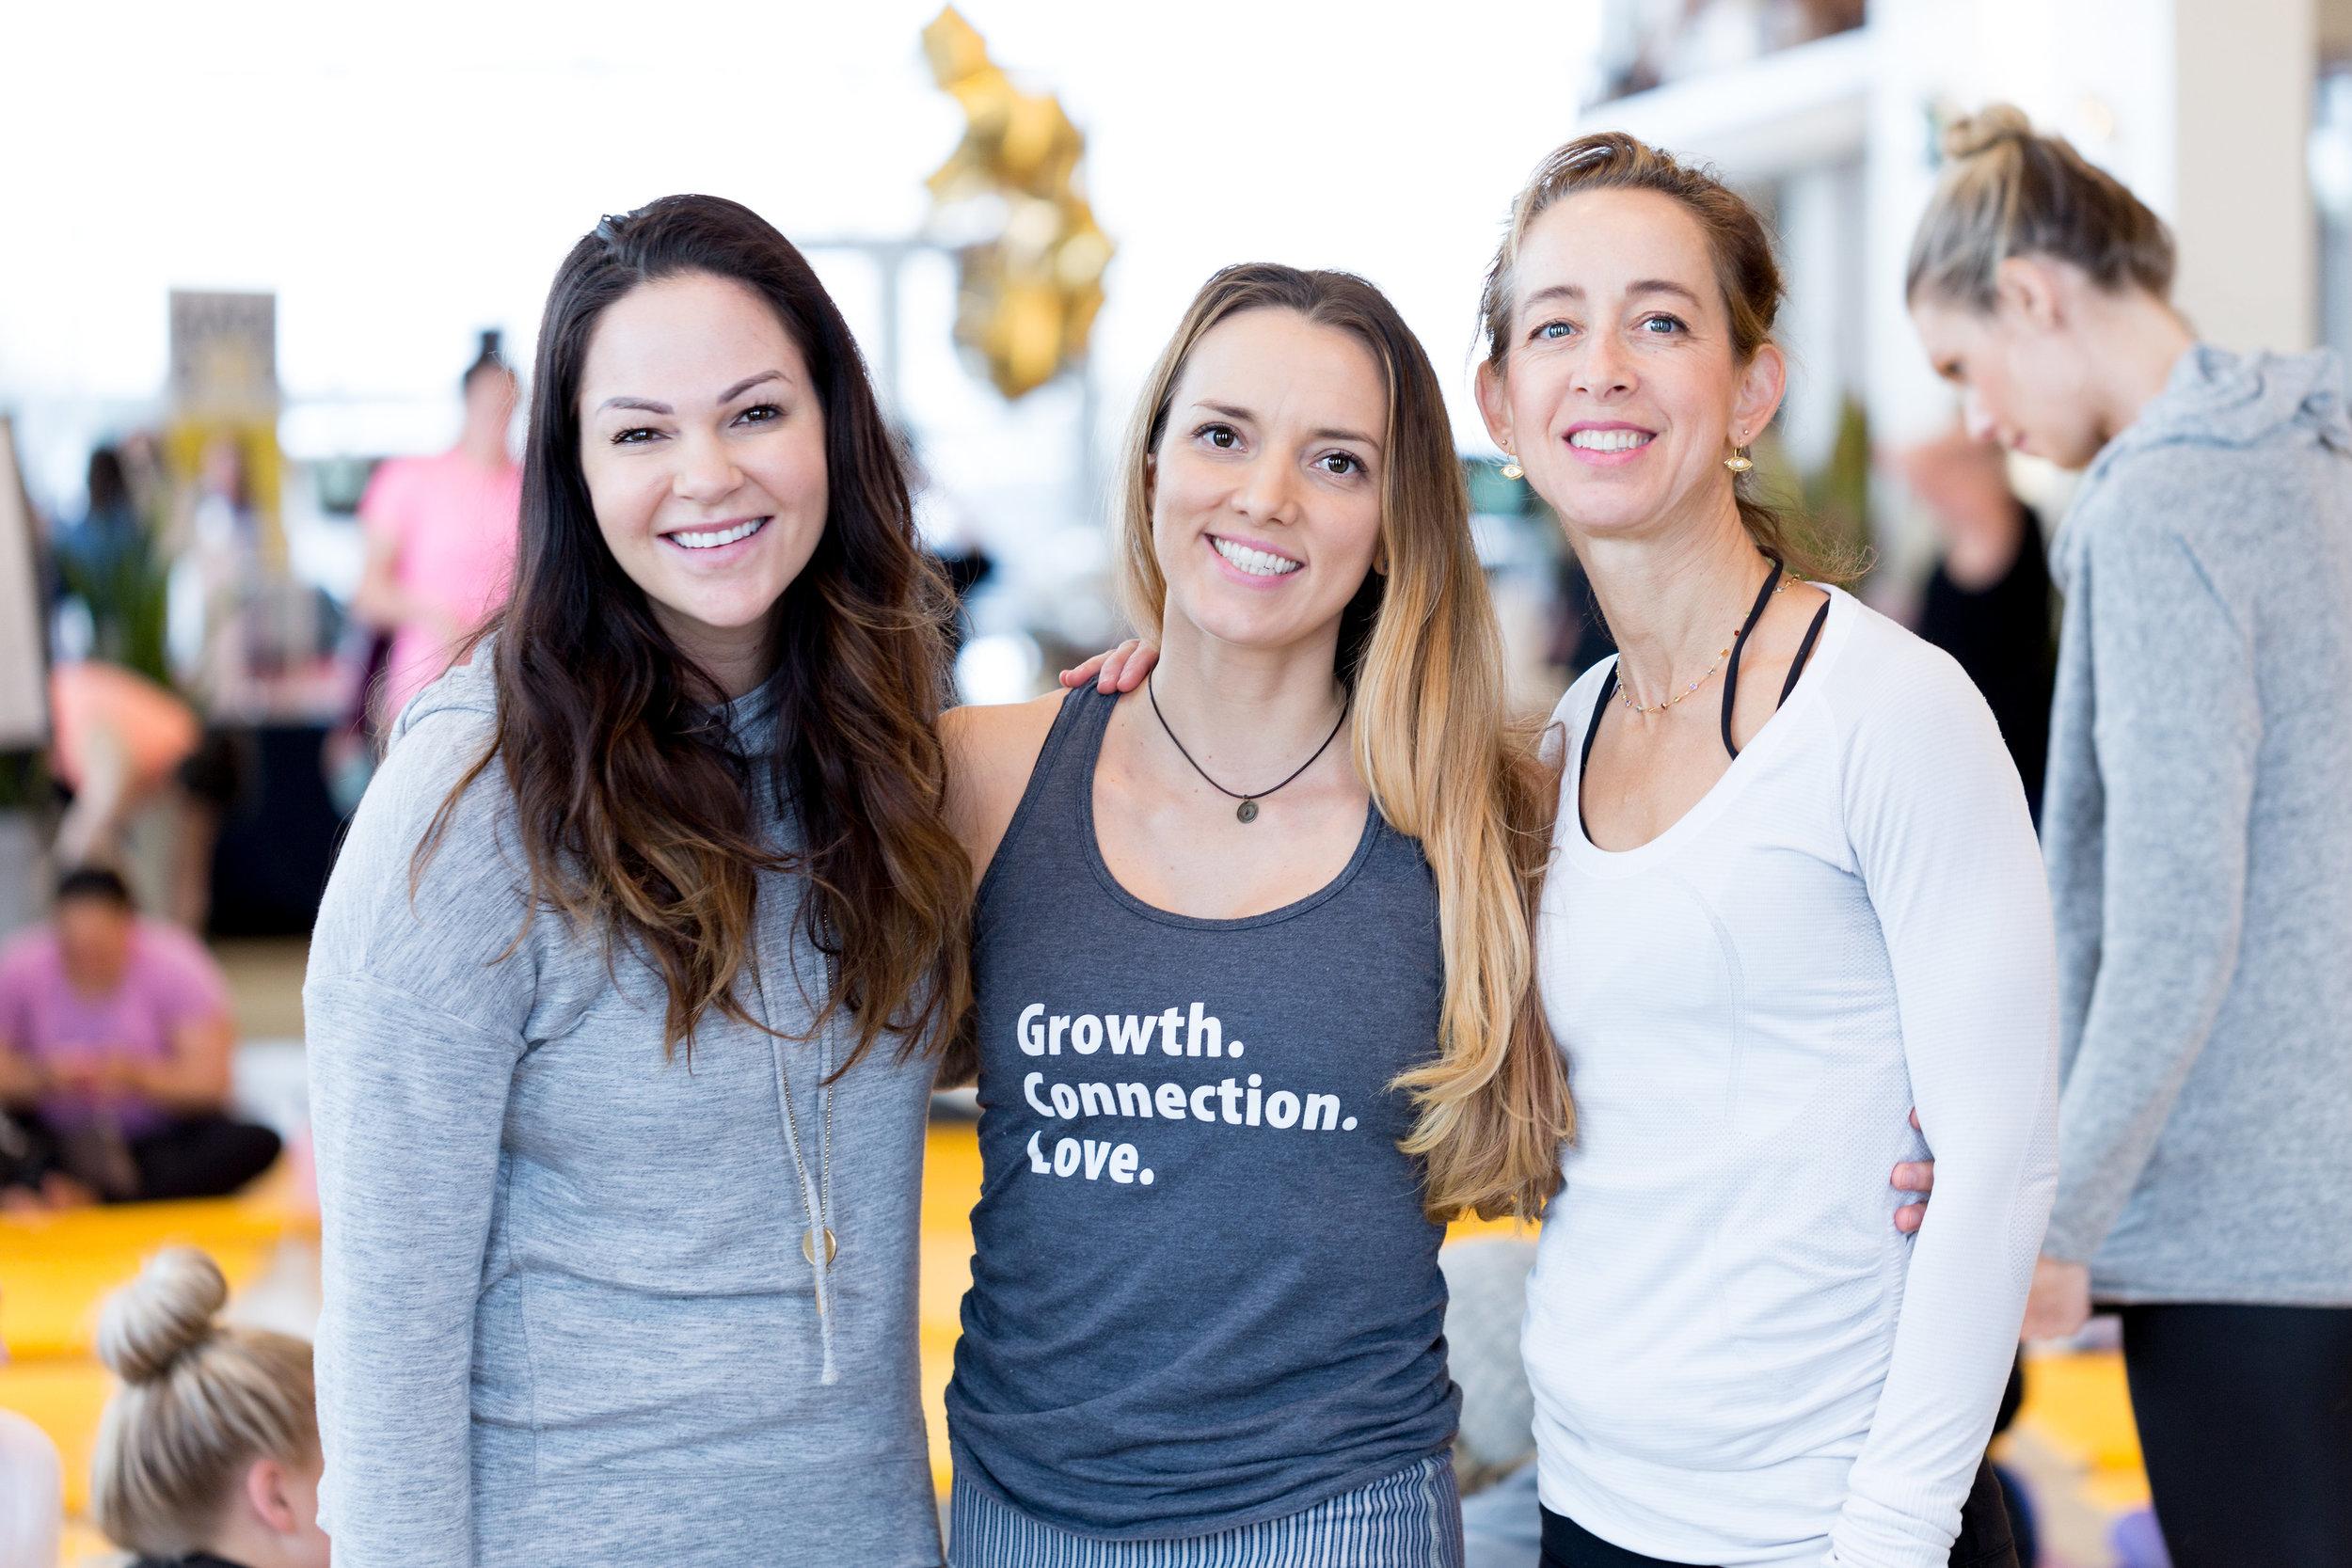 Yoga instructors Katie Miller, Danielle Jokinen and Jes Rosenberg.